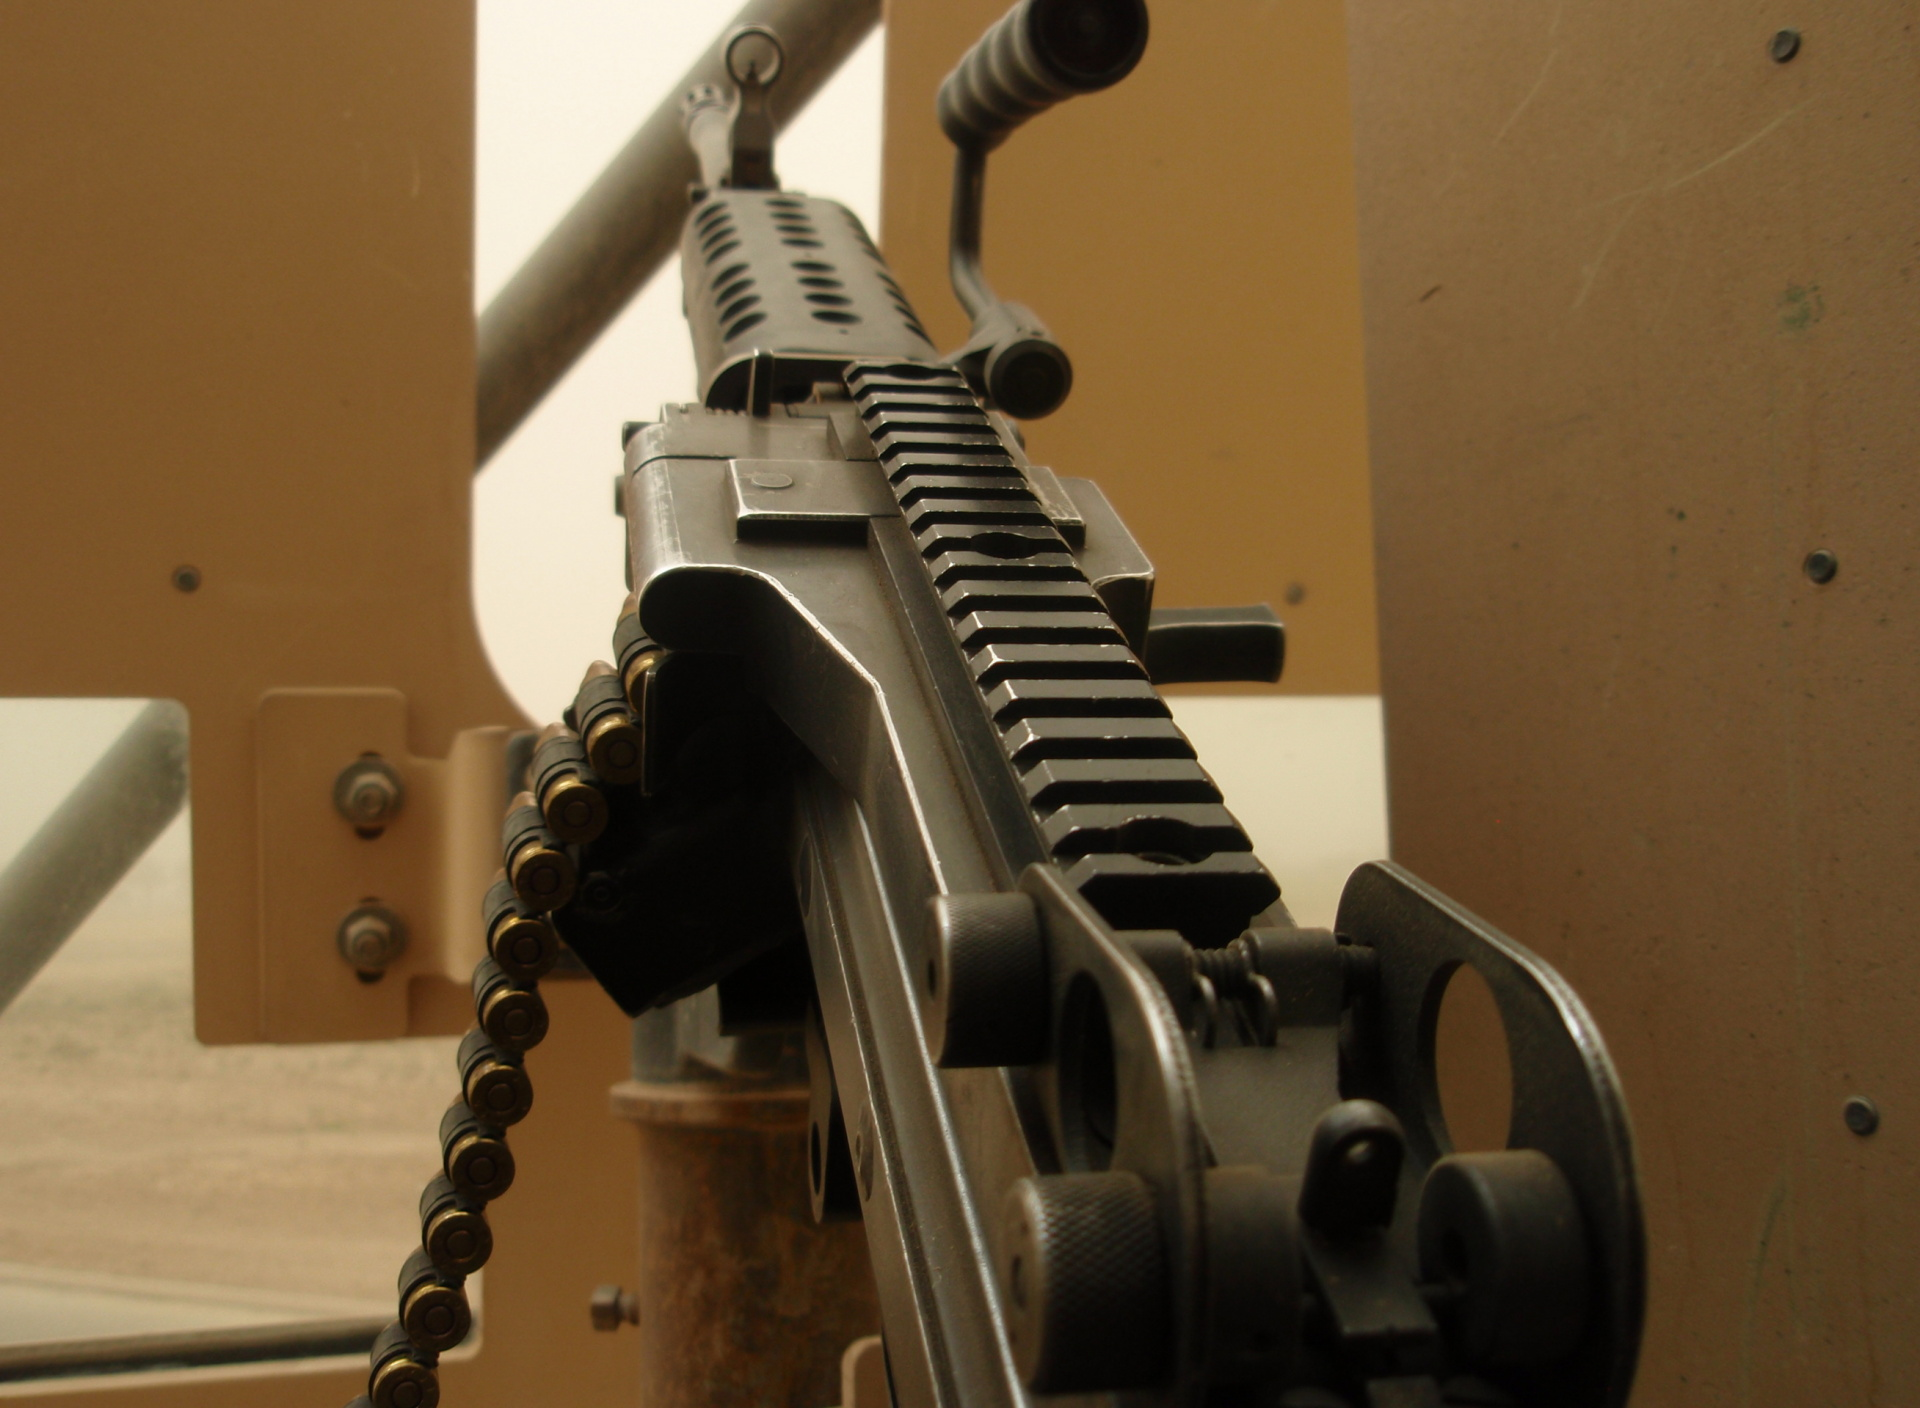 Tags Machine gun 1920x1408 wallpaper1920X1408 wallpaper screensaver 1920x1408